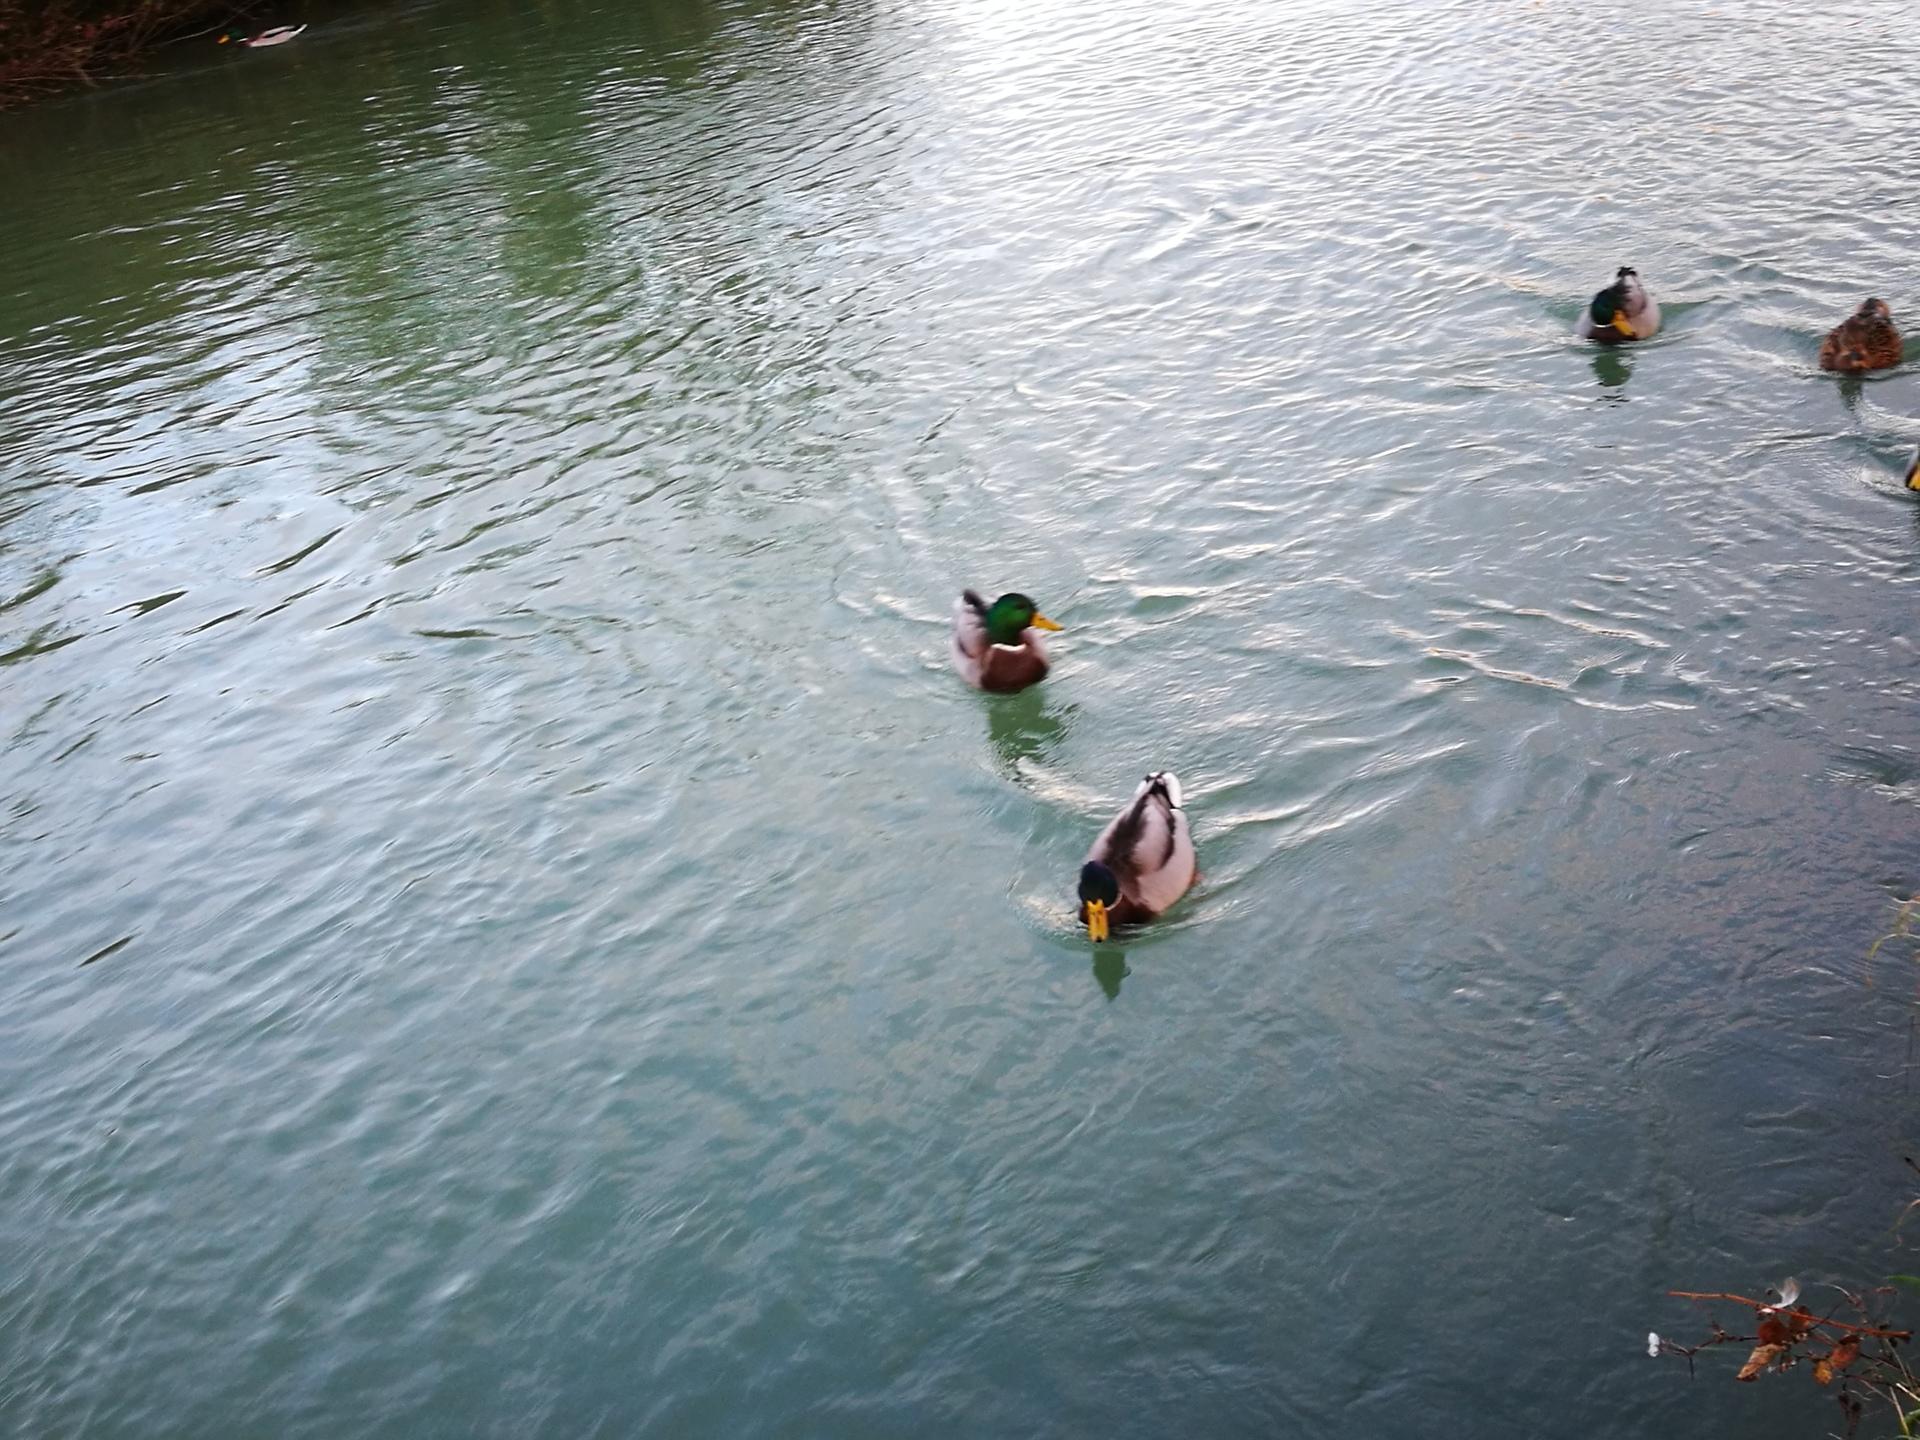 two ducks | robtimusprime, water, river, swimming